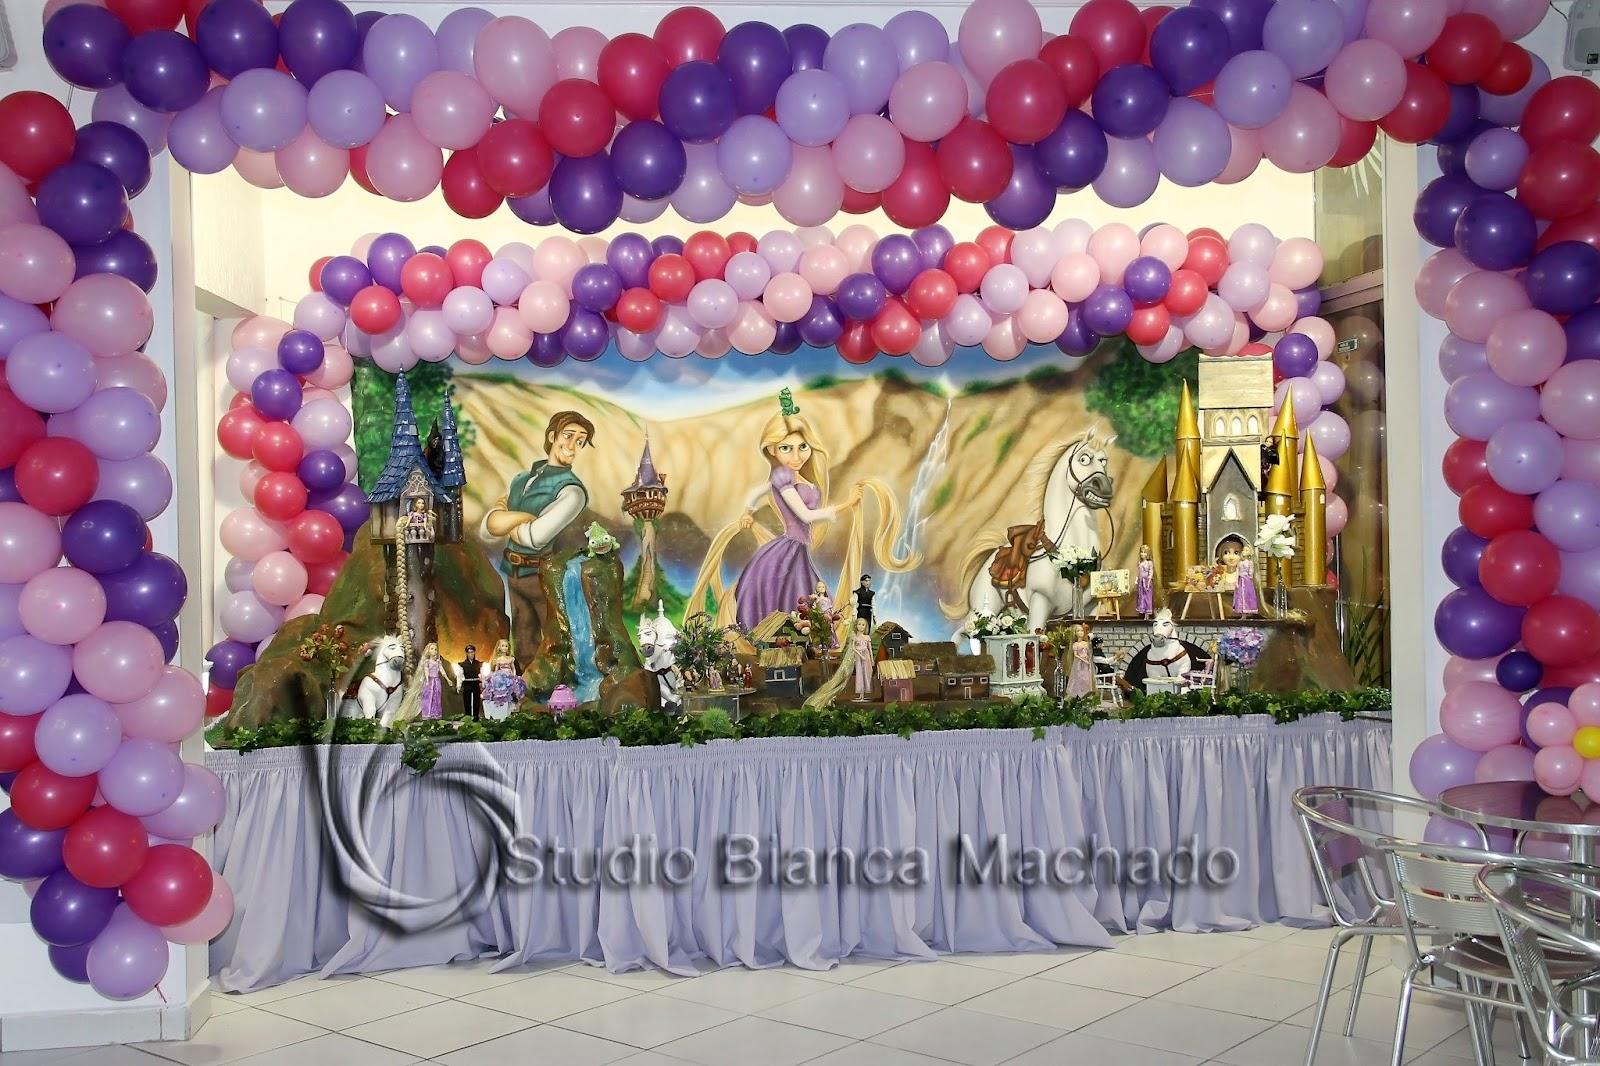 Fotos De Festa De Aniversario Infantil Temas De Festa Infantil